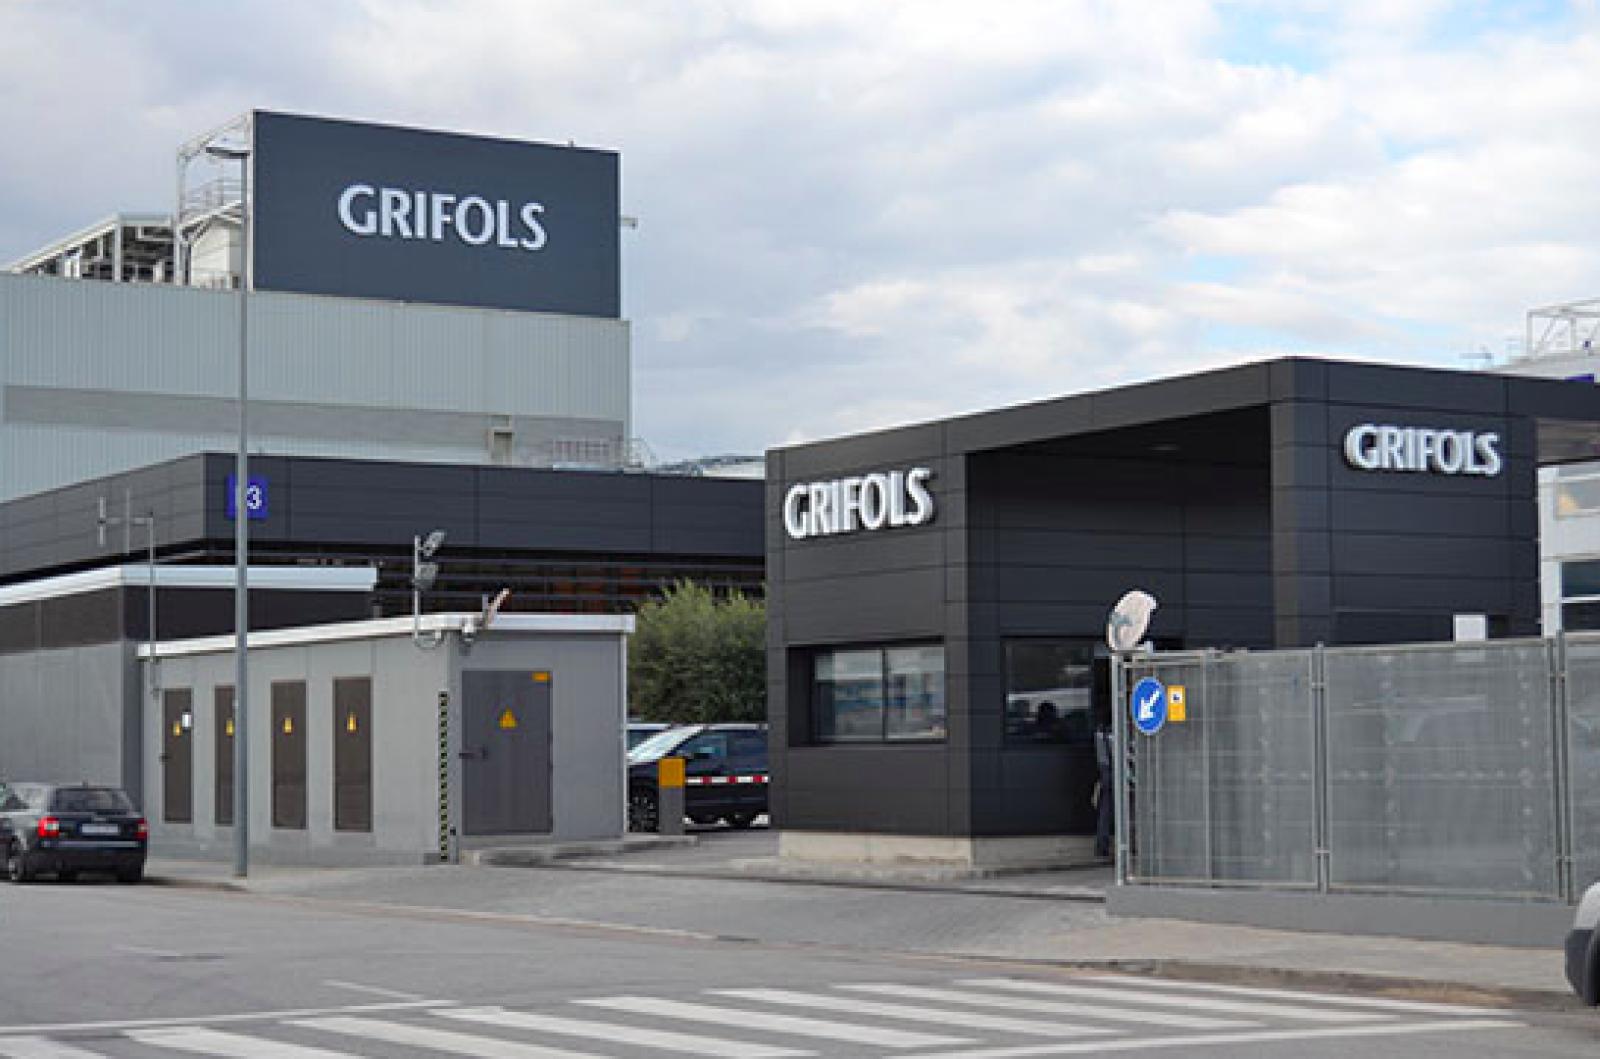 L'empresa Grífols